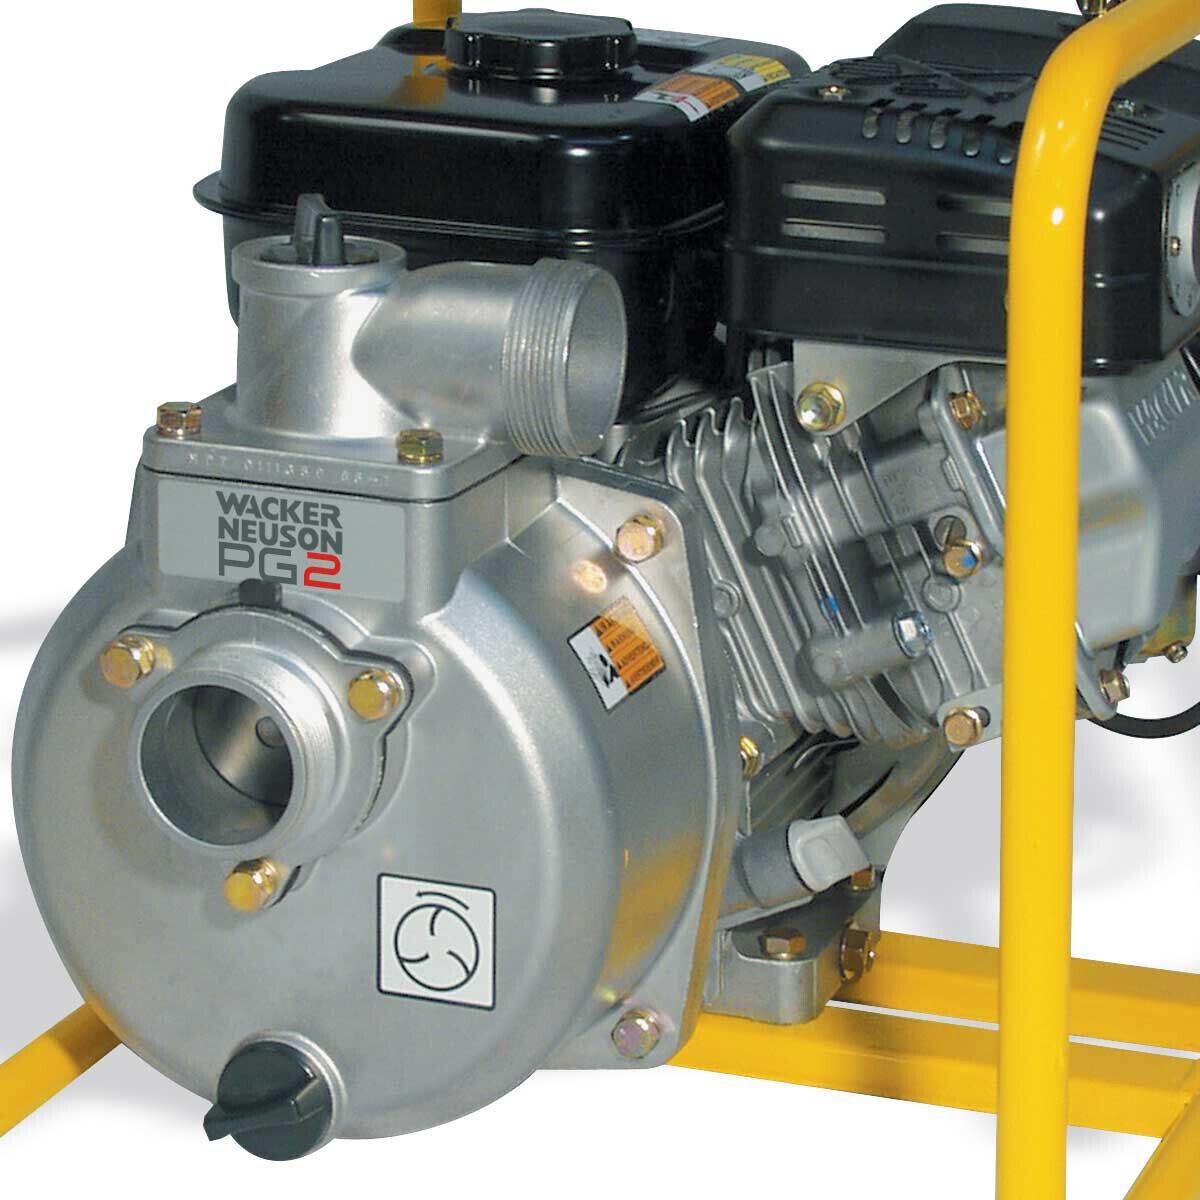 Wacker Neuson PG2A Dewatering Pump